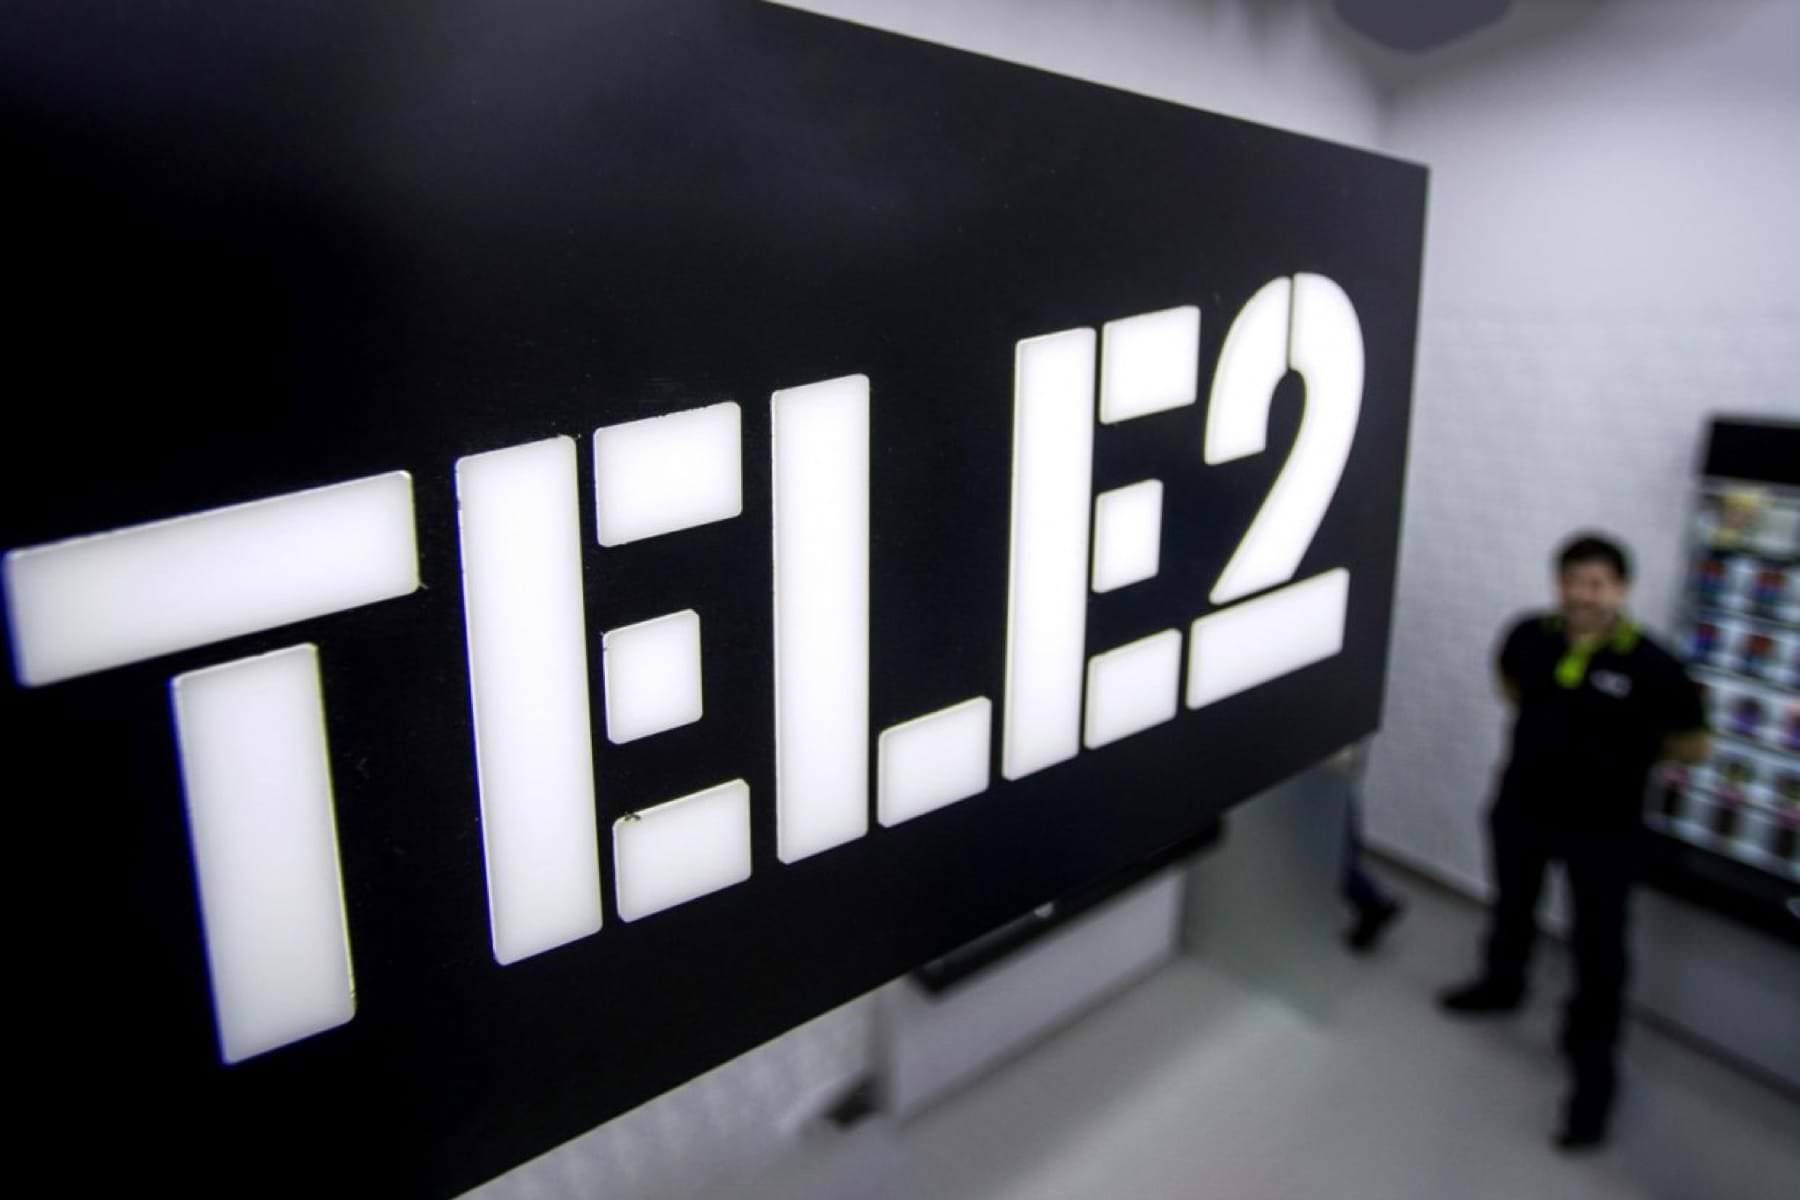 ФАС возбудила дело против Tele2 за повышение тарифов